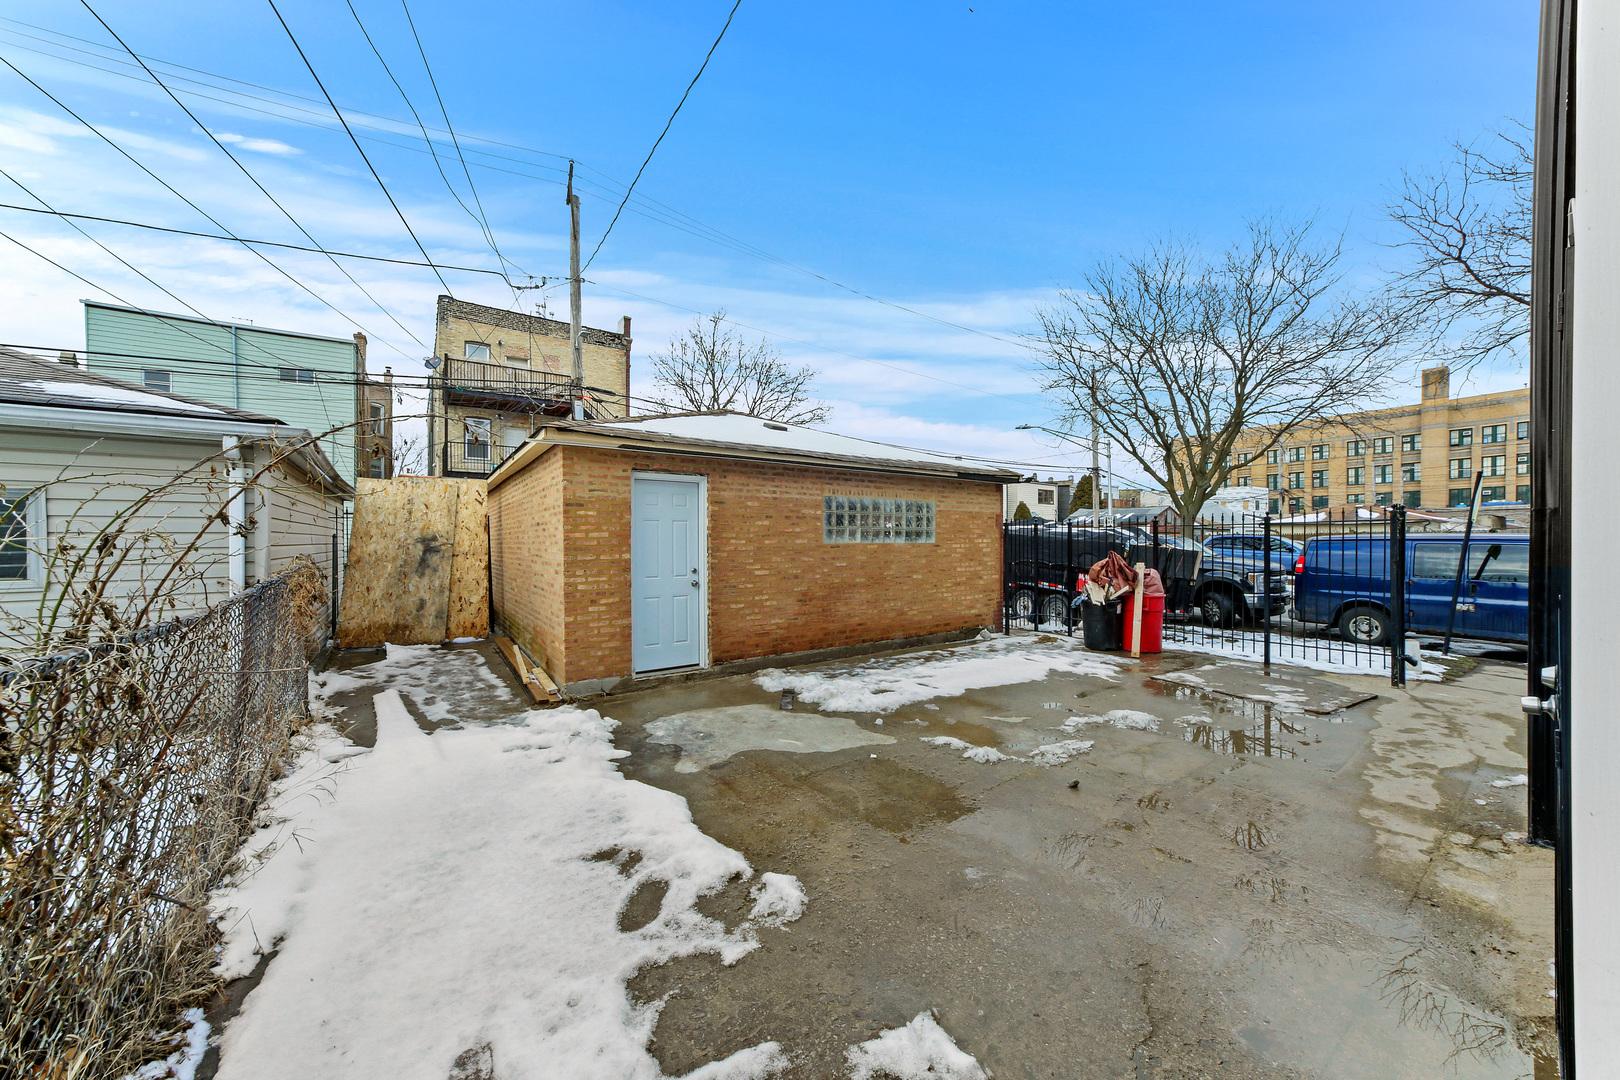 4200 West Kamerling, Chicago, Illinois, 60651